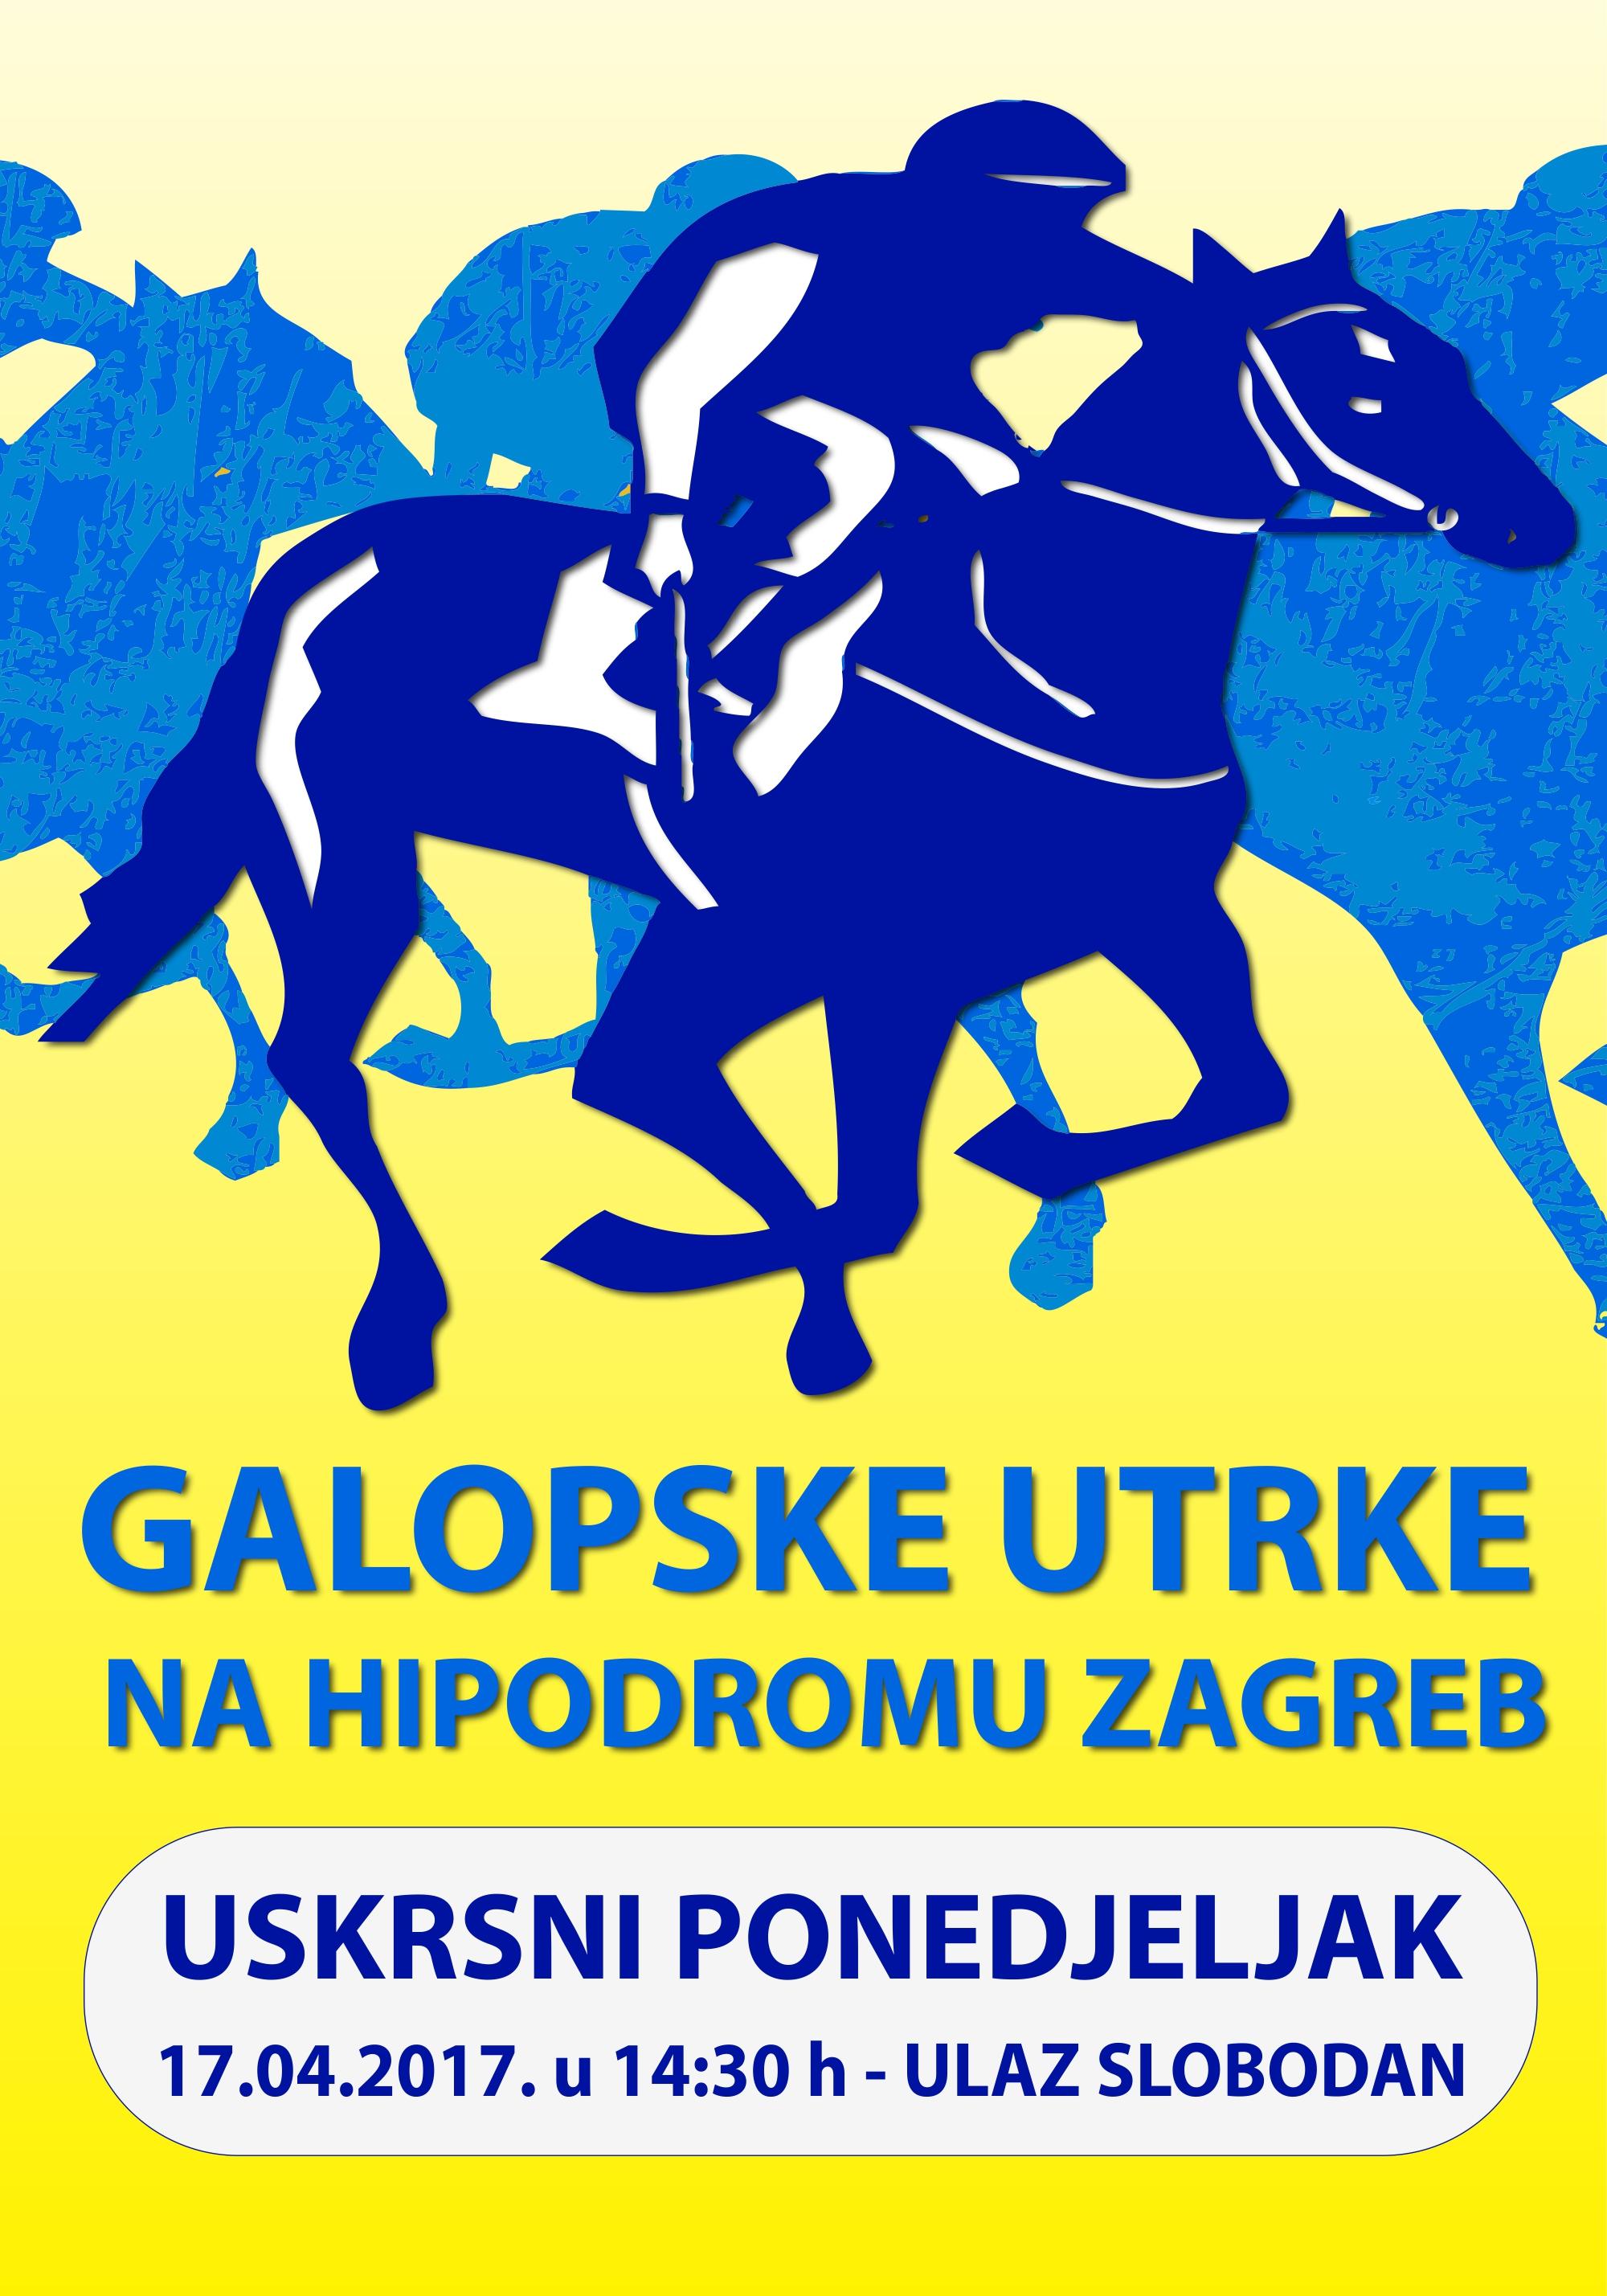 plakat-tradicionale-uskrsne-galopske-utrke-zagreb-17-04-2017